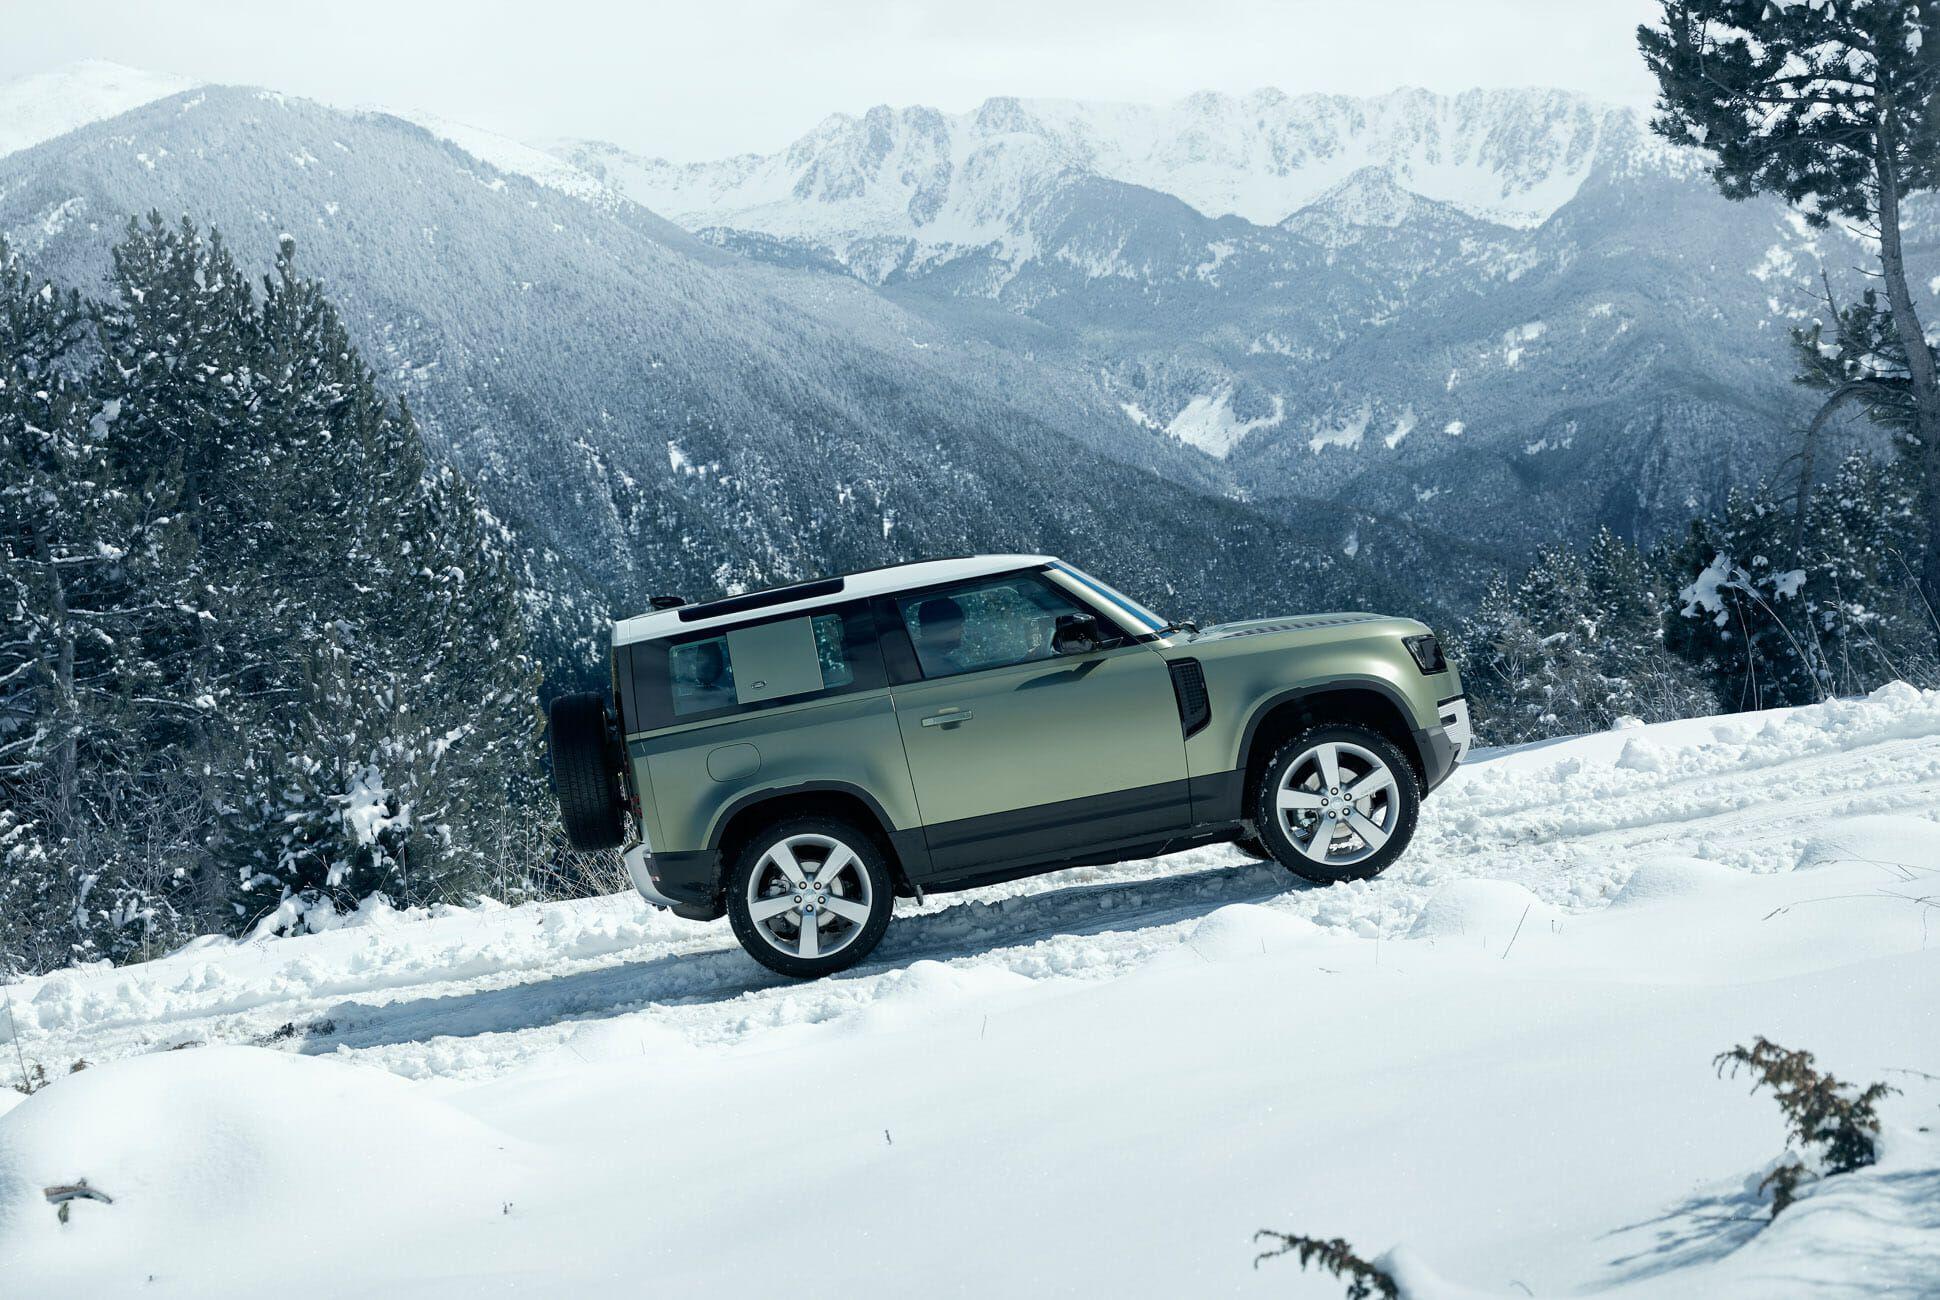 Land Rover Defender Gear Patrol-Exterior Action-Slide-04